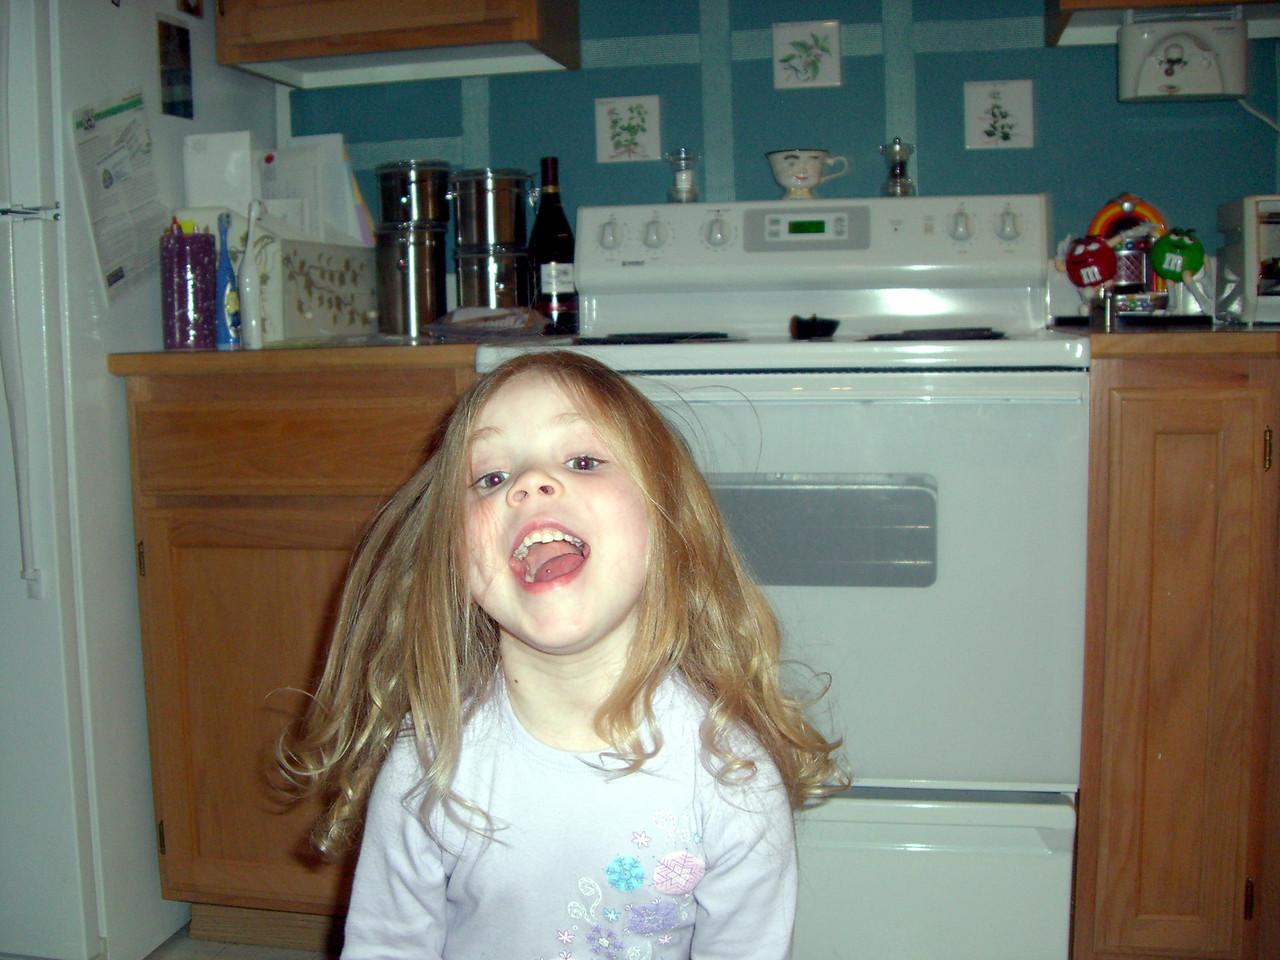 She's crazy!